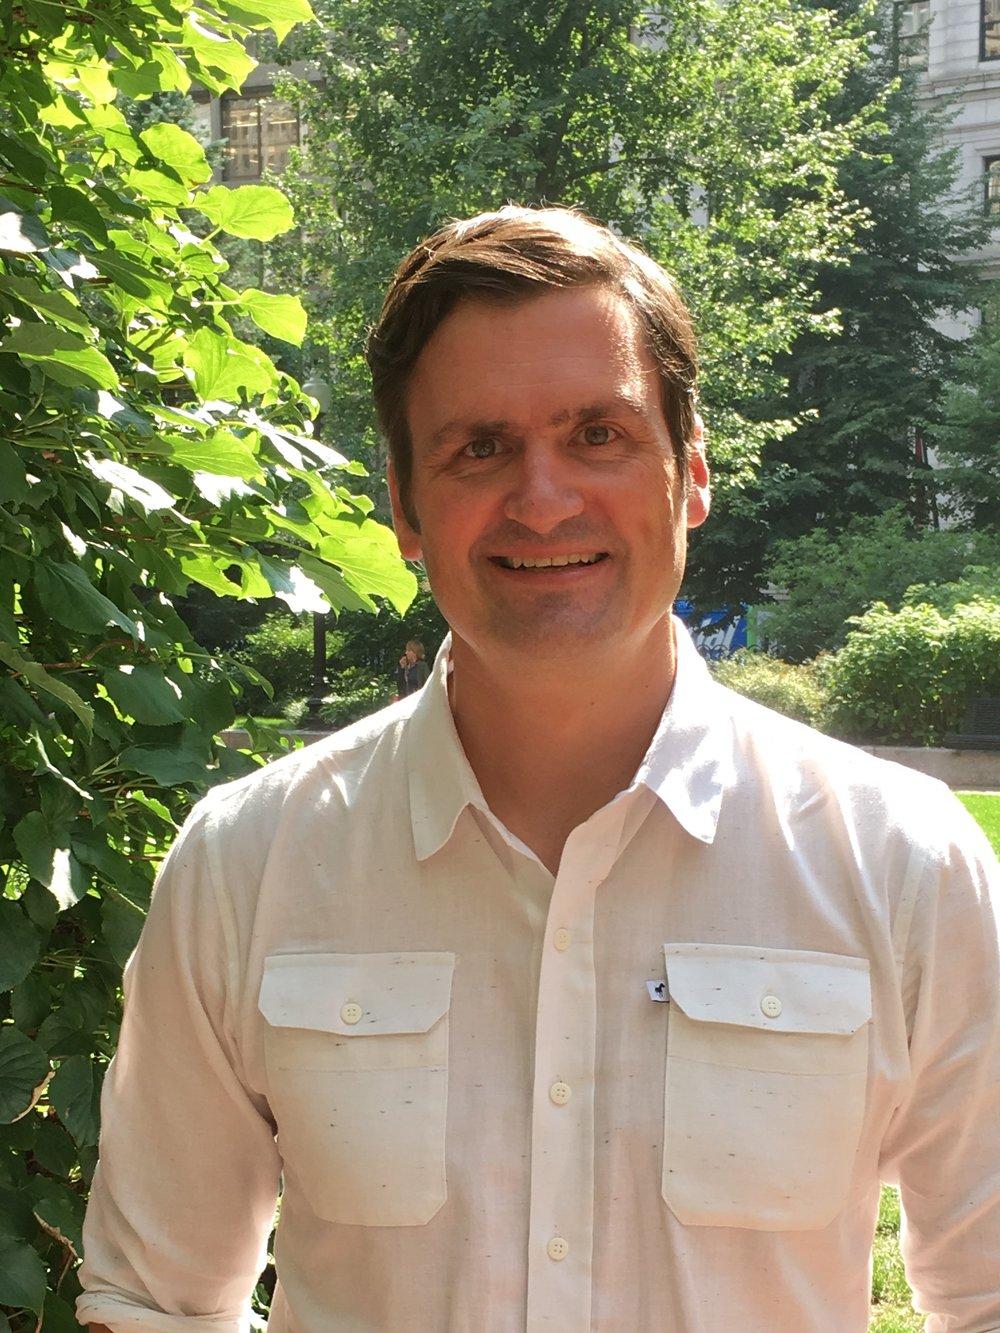 Joe Michie - Senior Director of Partnerships